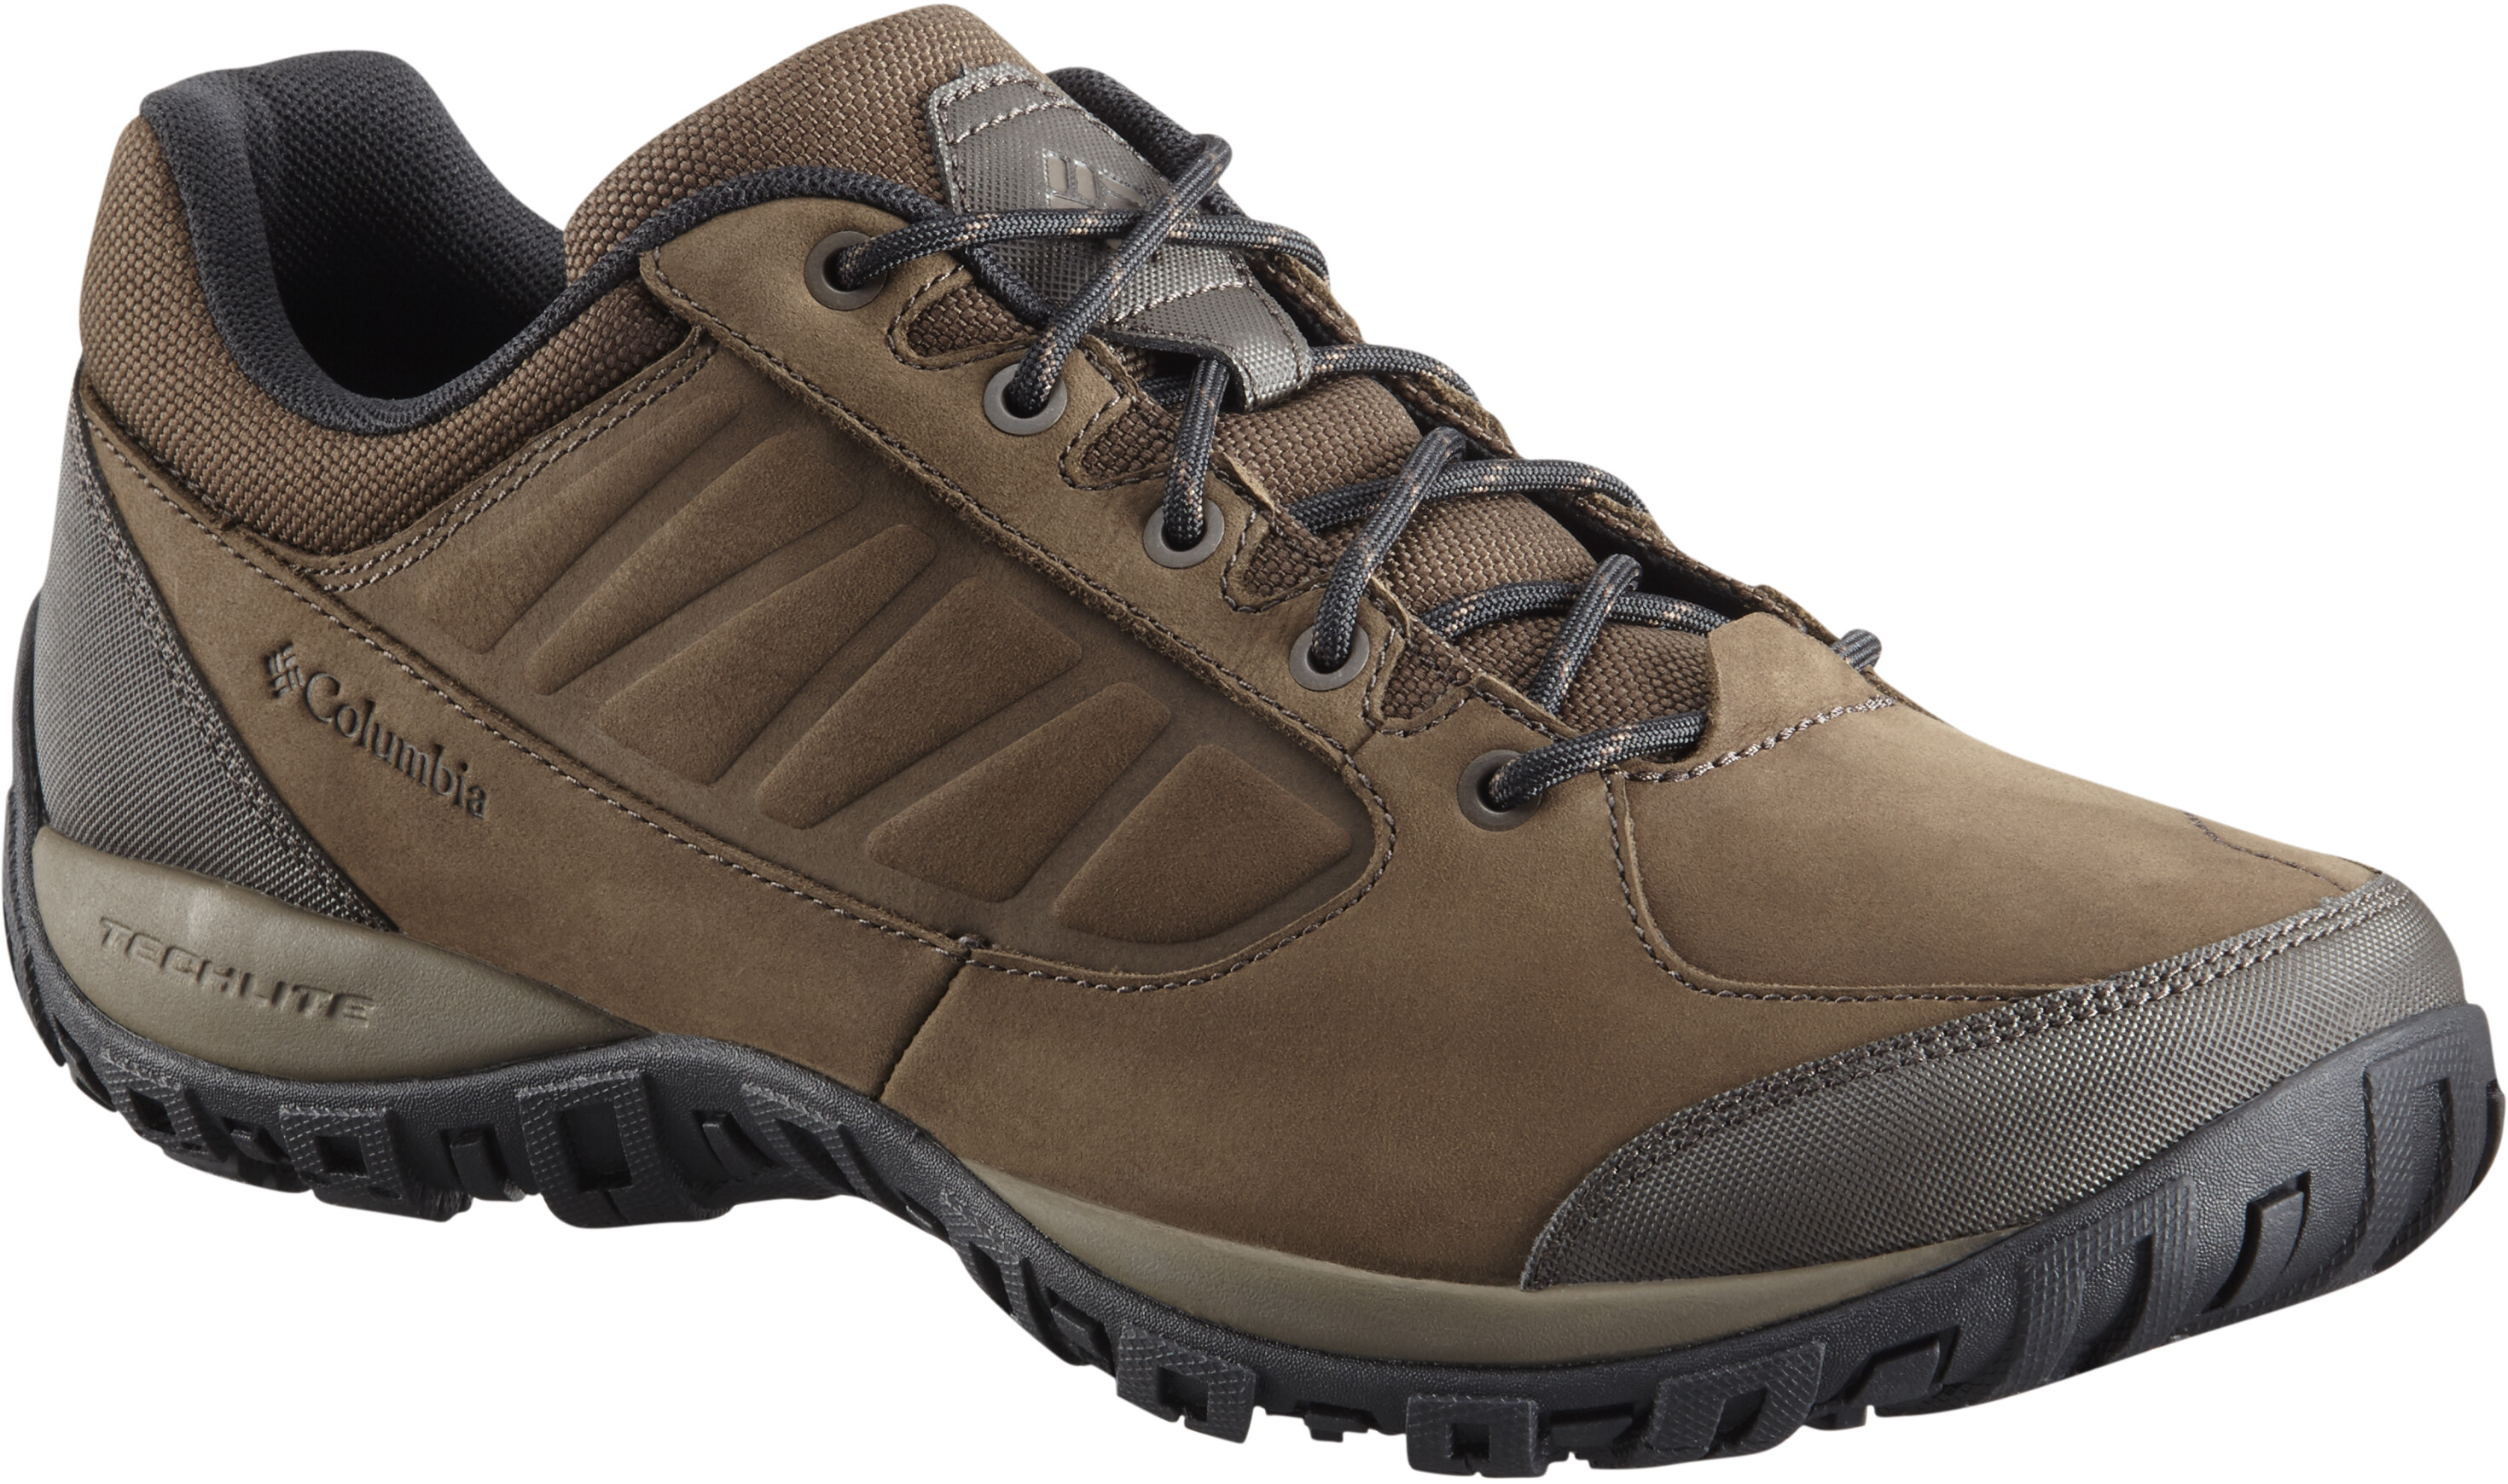 Columbia Ruckel Ridge Plus Miehet kengät  b536067e74